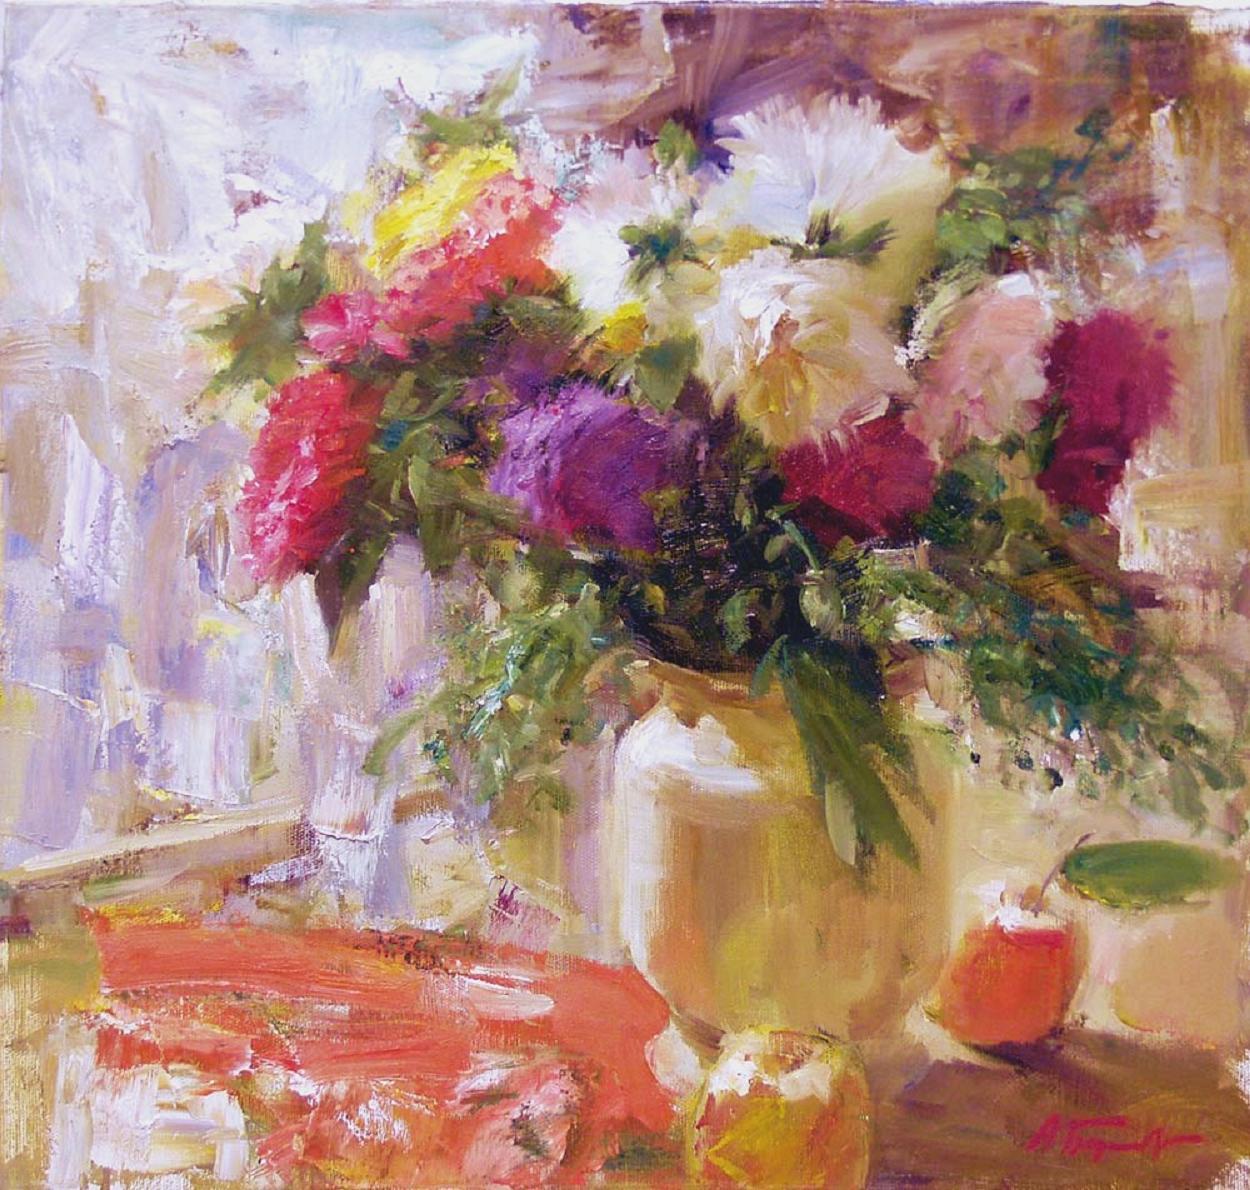 Andrian Bersenev. Flowers and Apples. 2000s | Art and Faith: http://01varvara.wordpress.com/2008/07/15/andrian-bersenev-flowers-and-apples-2000s/